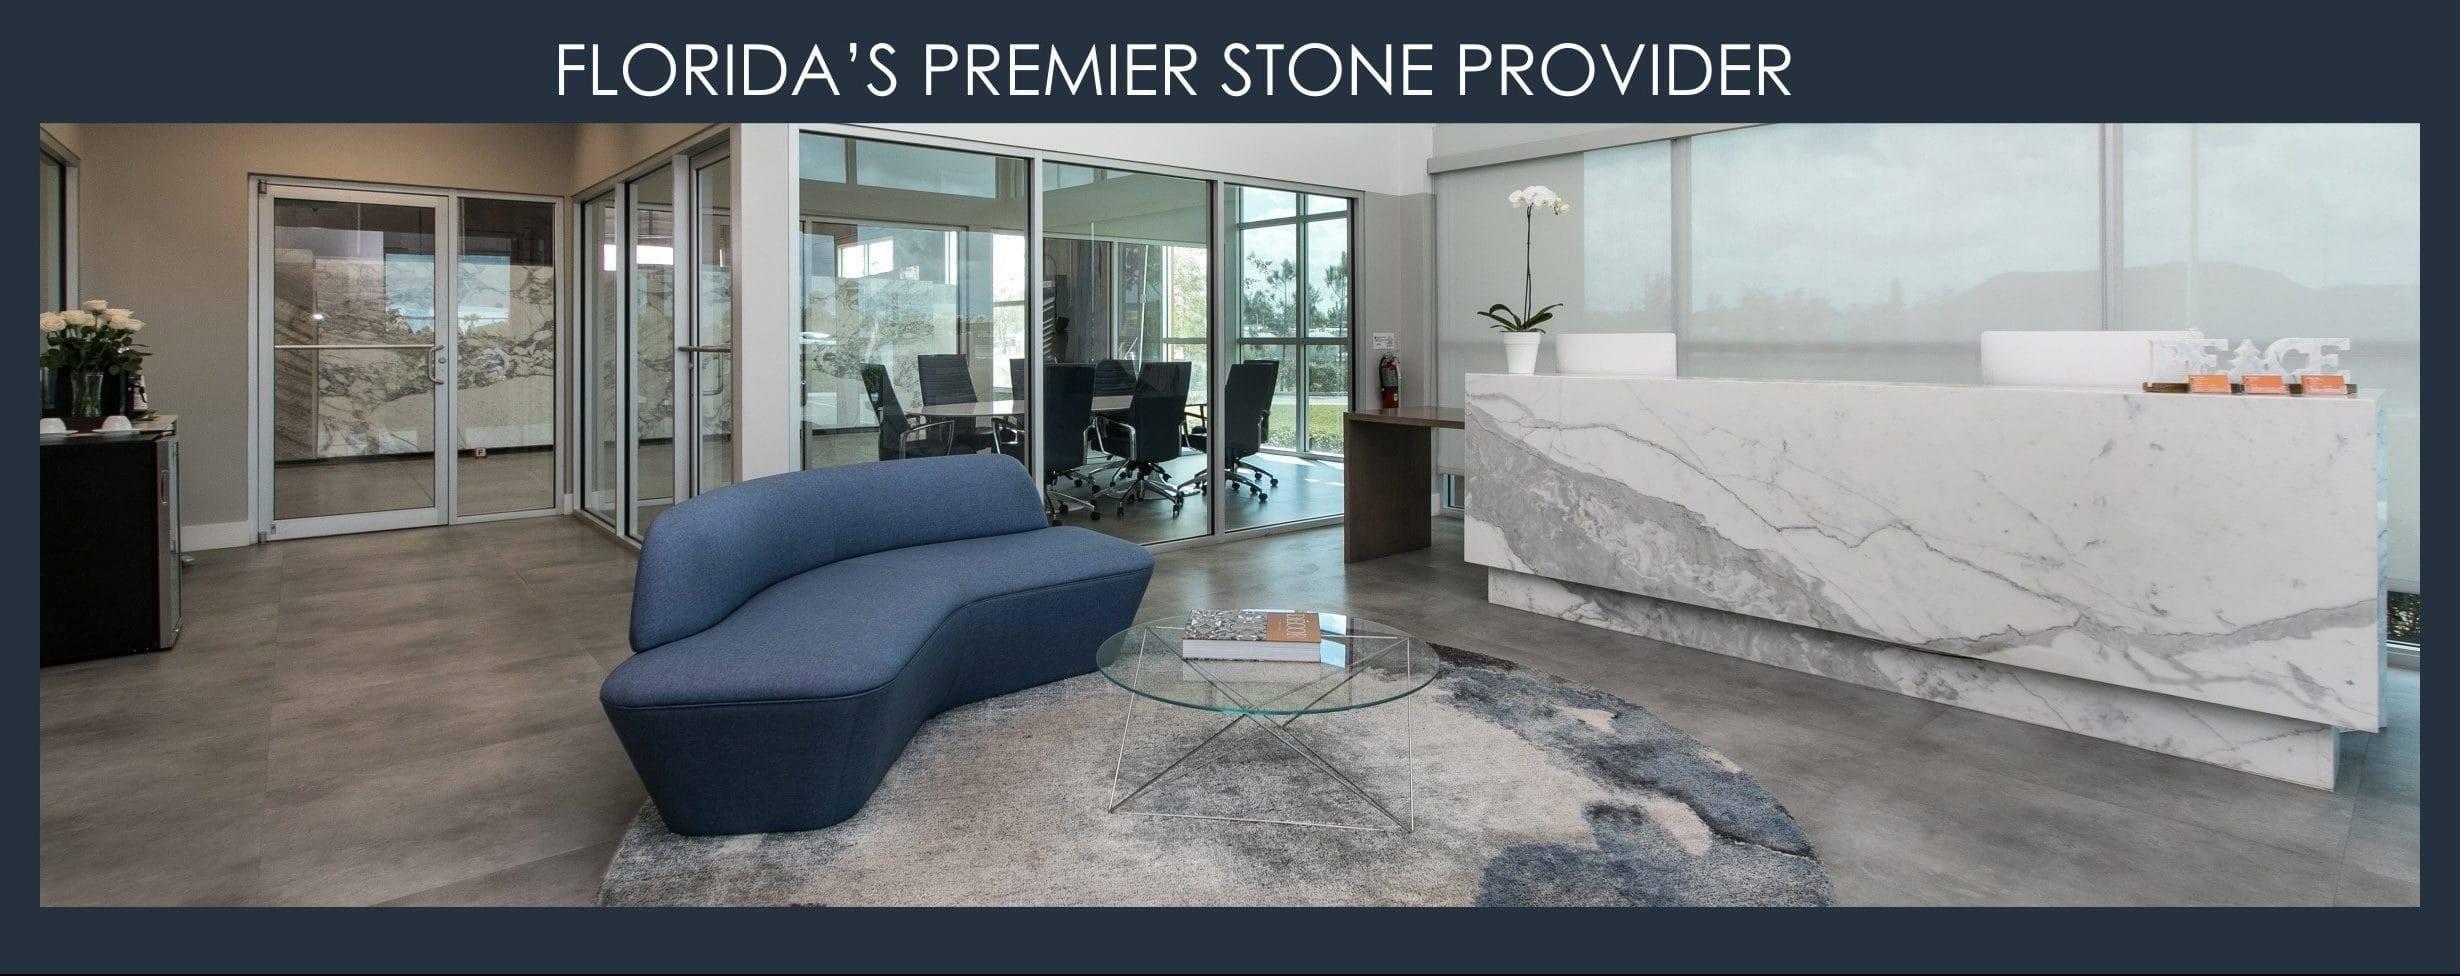 LANDSCAPE PHONE WEB E1596653725519, Primestones® Granite, Quartz, Marble